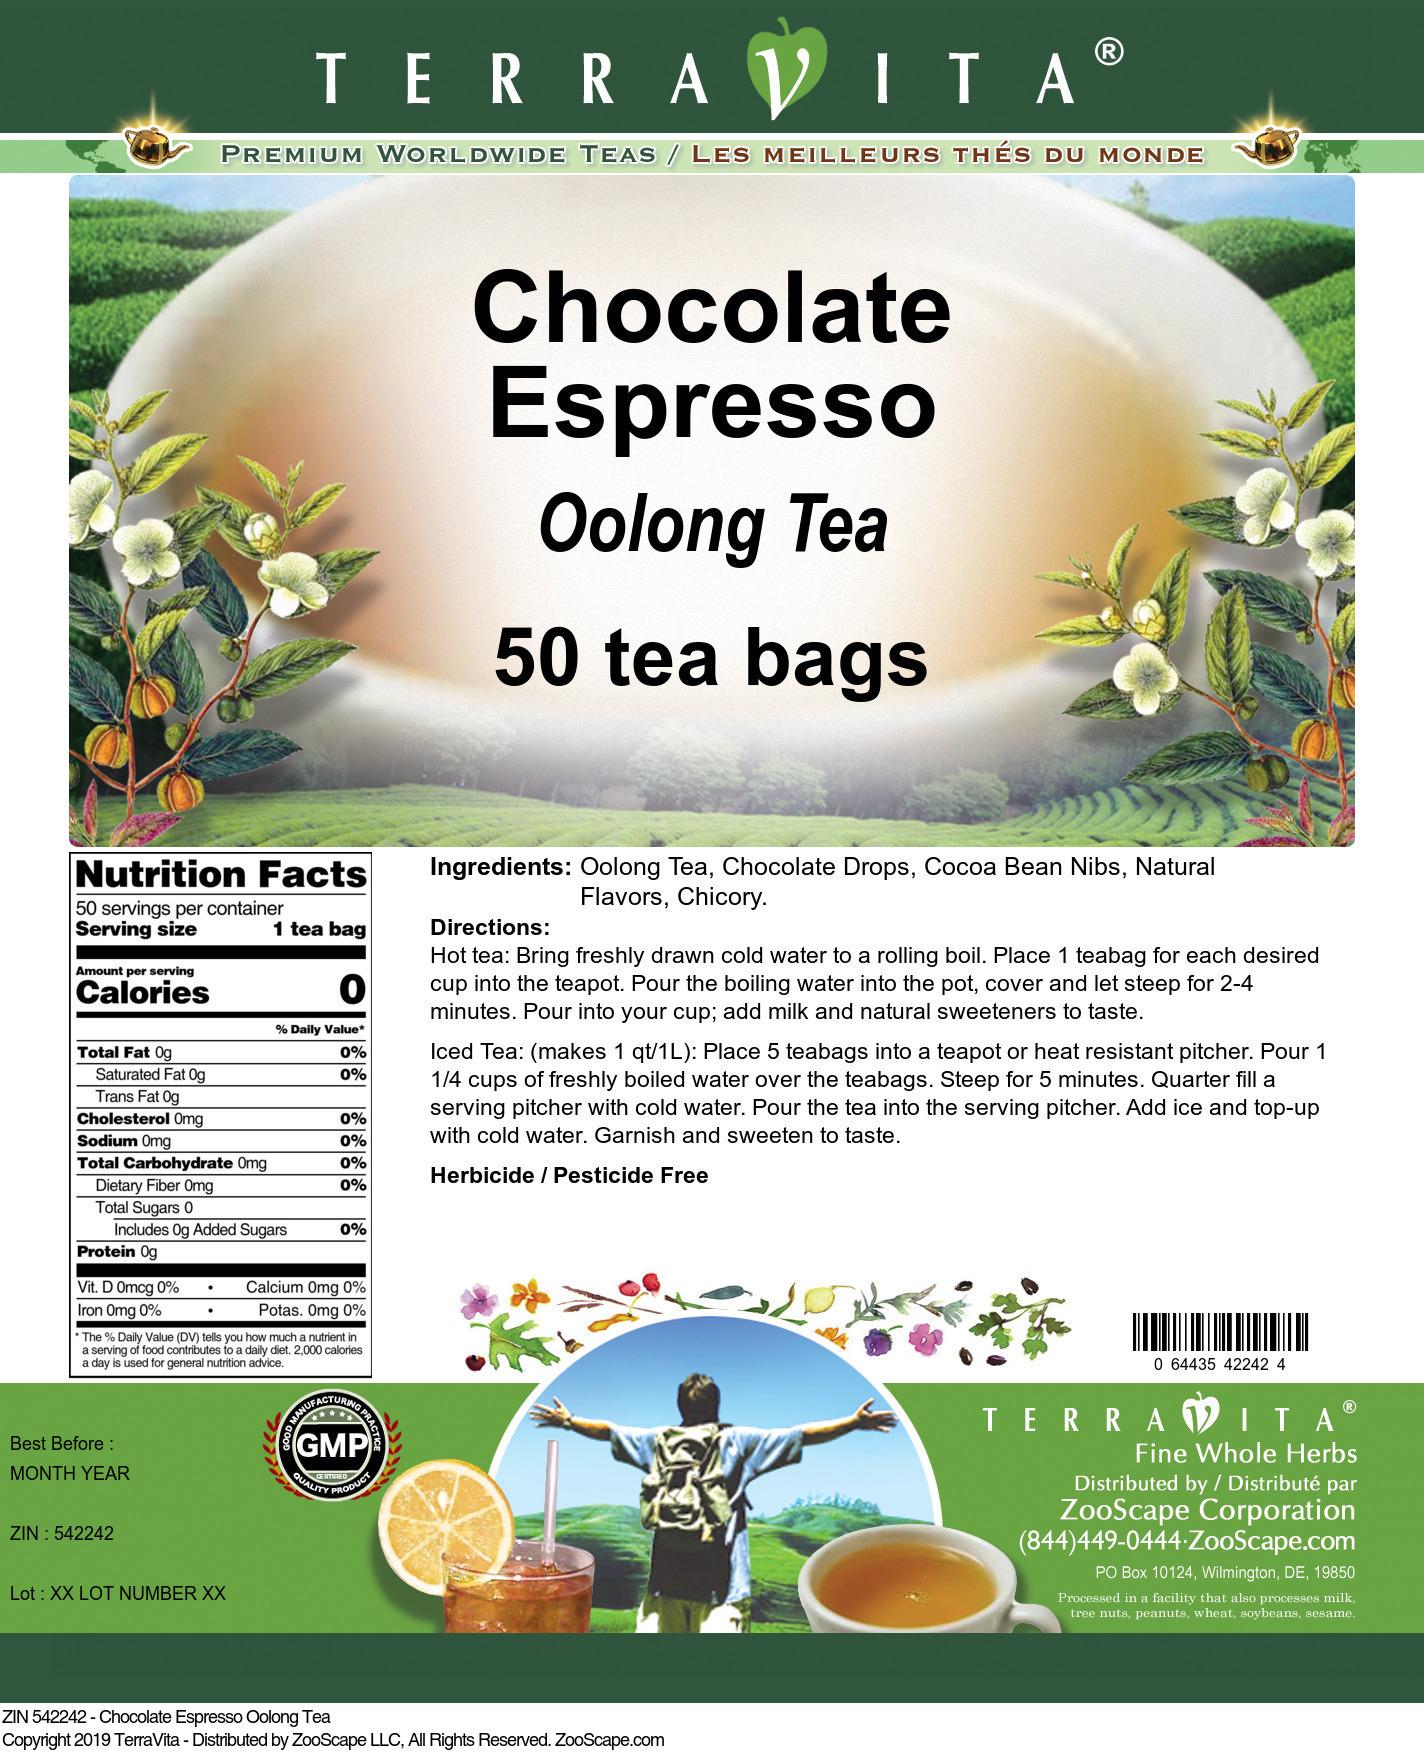 Chocolate Espresso Oolong Tea